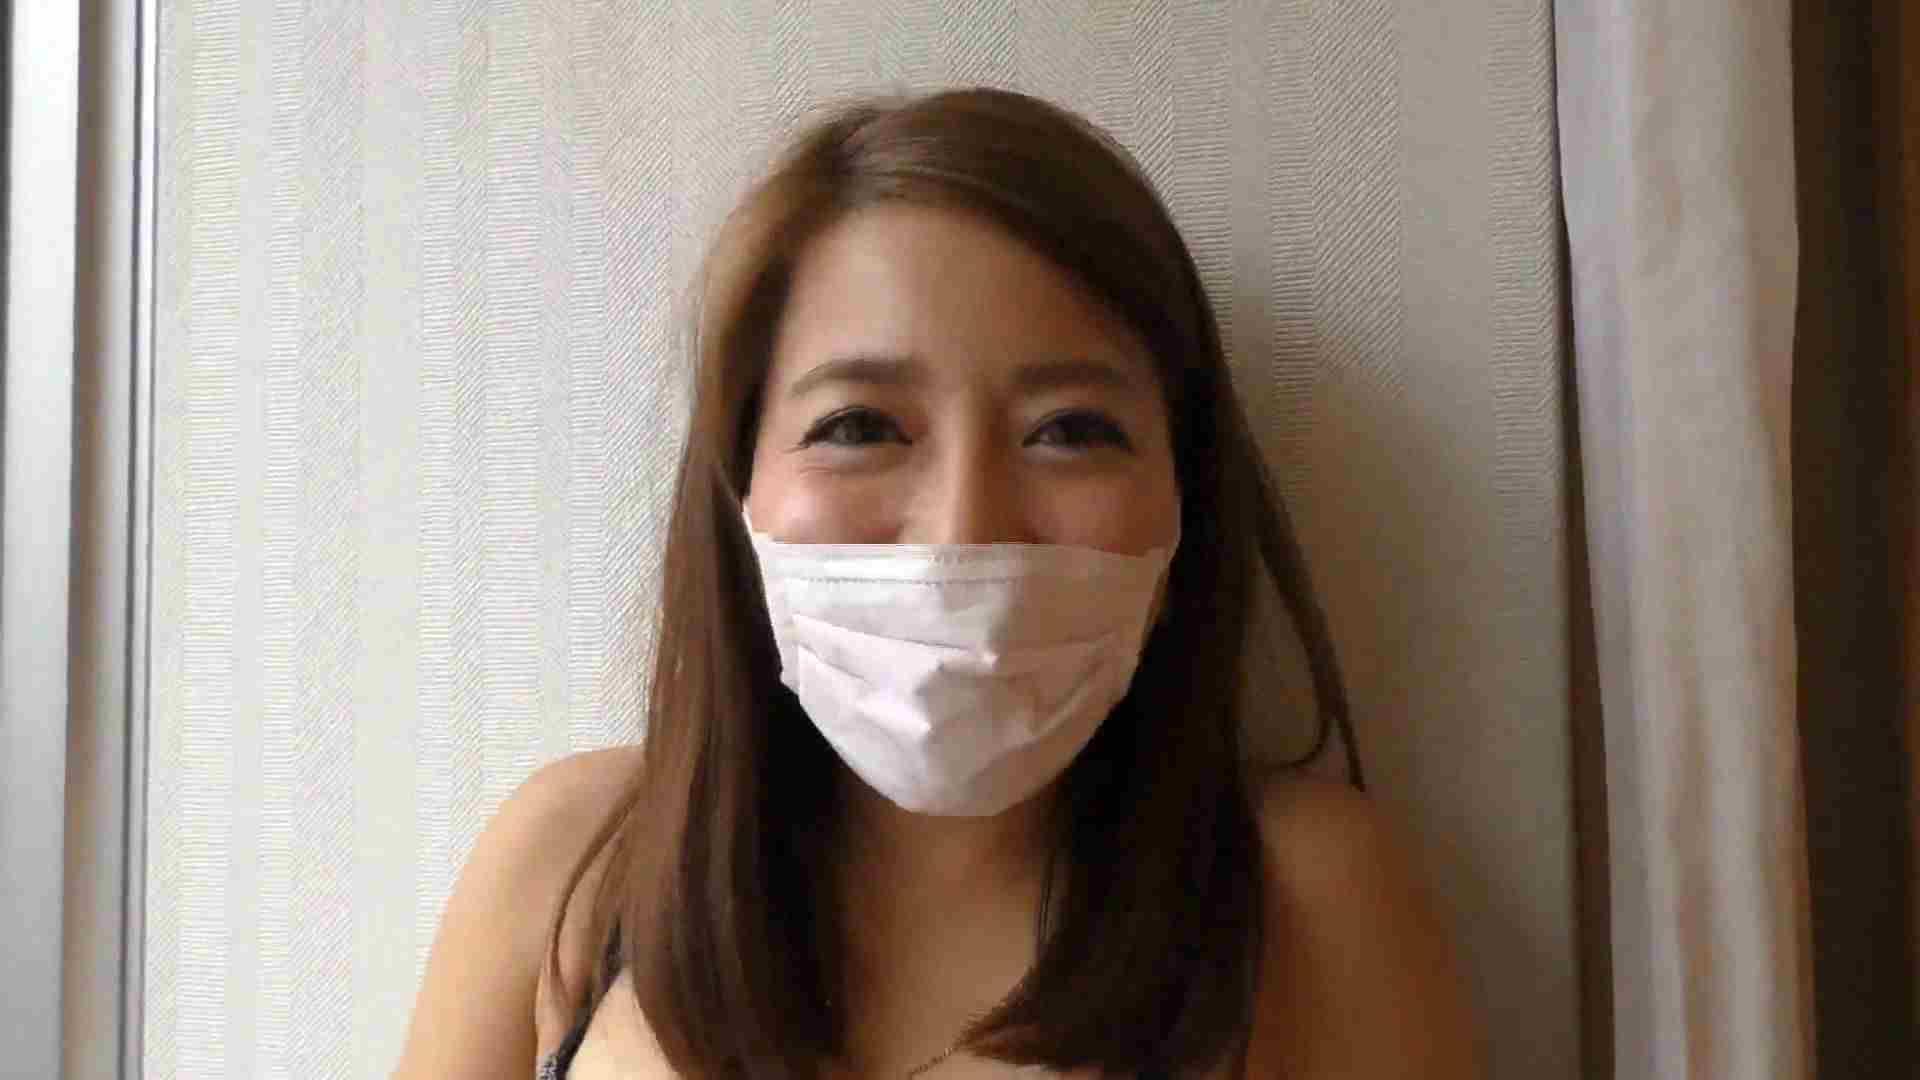 S級厳選美女ビッチガールVol.21 美女  77枚 31